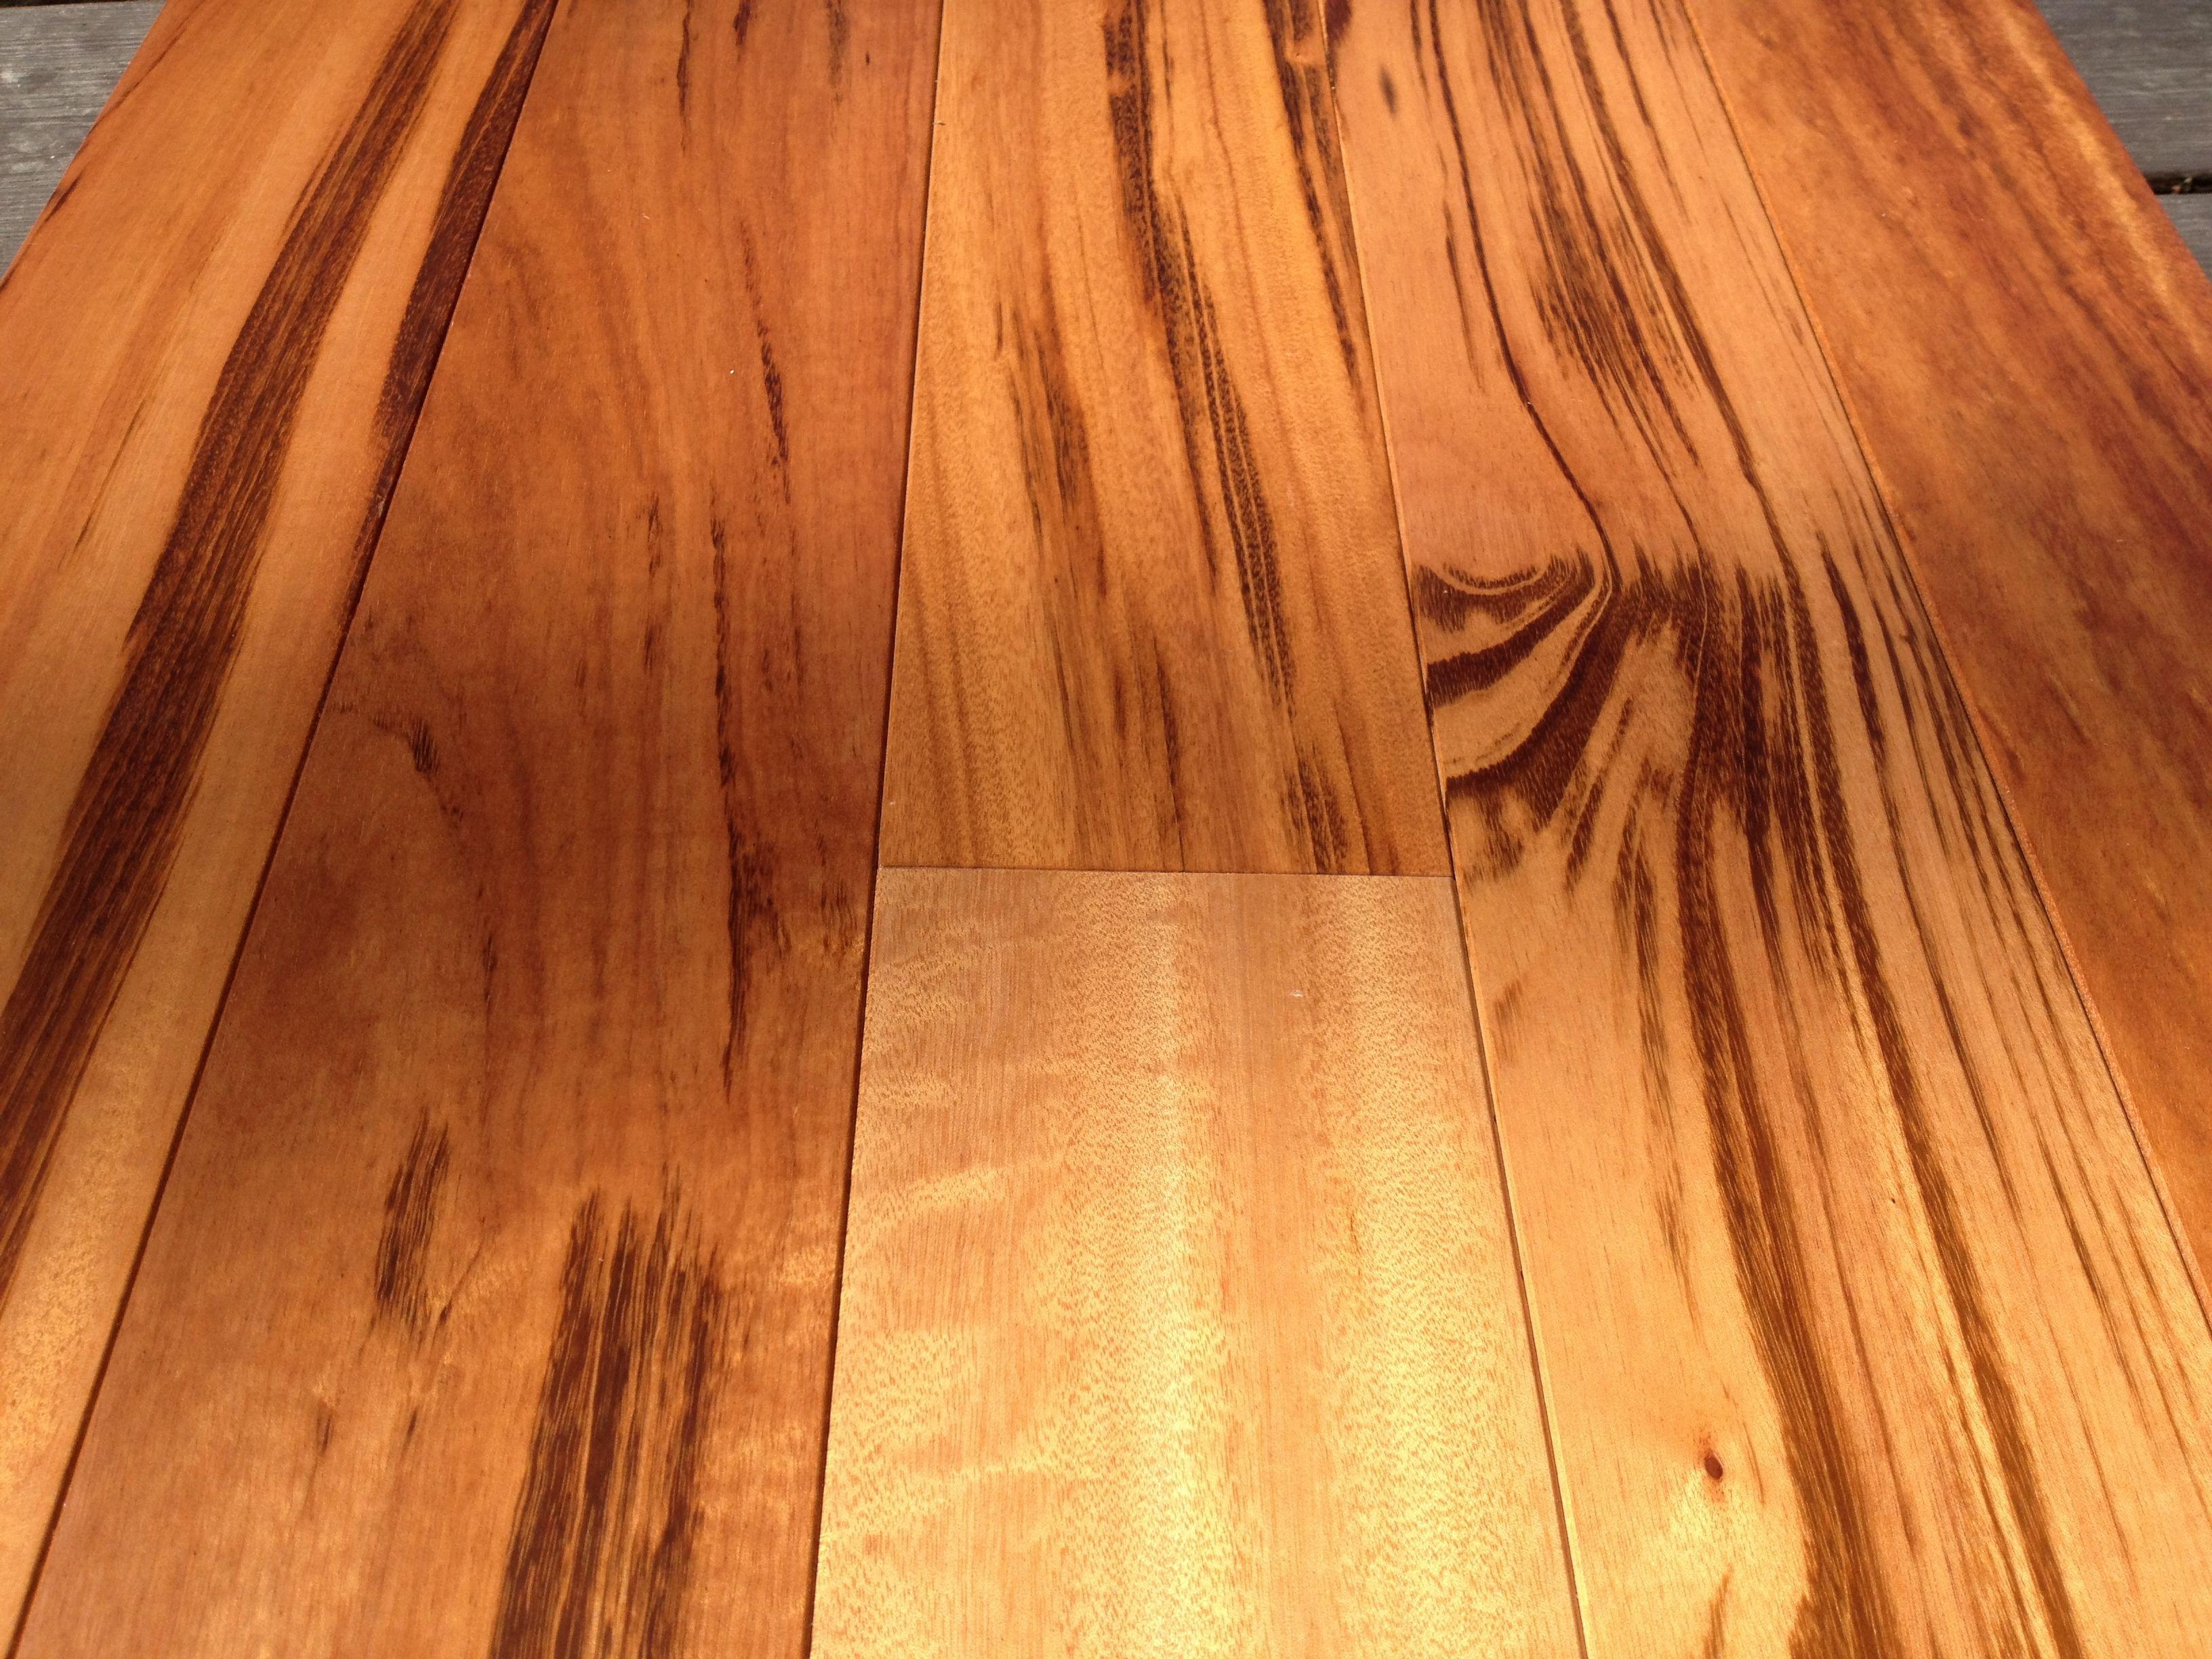 unfinished ipe hardwood flooring of brazilian walnut ipe hardwood flooring in tigerwood hardwood flooring